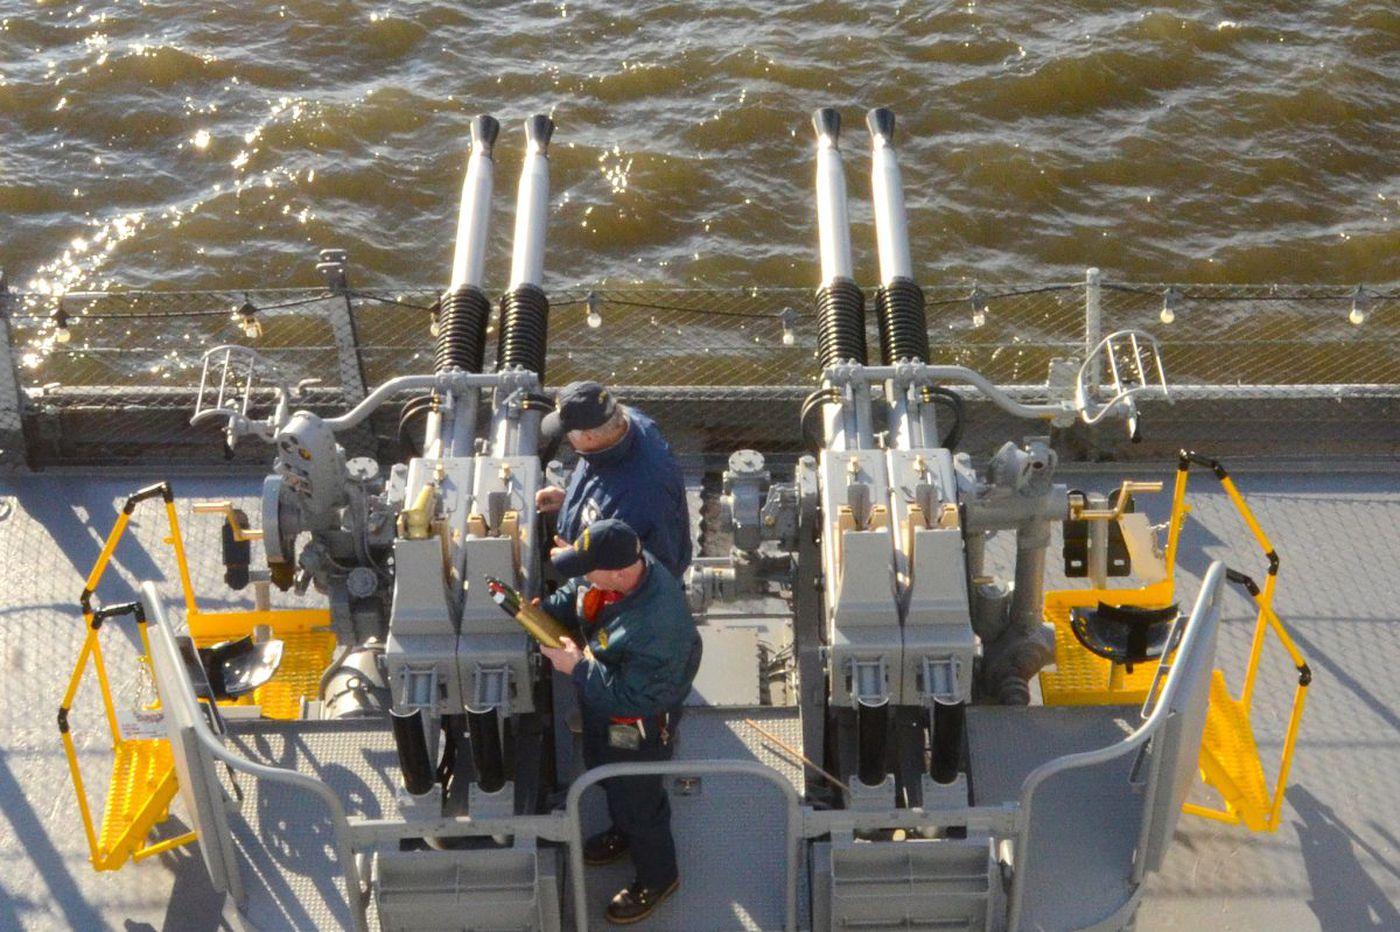 A WWII gun erupts again as Battleship New Jersey marks 75th anniversary